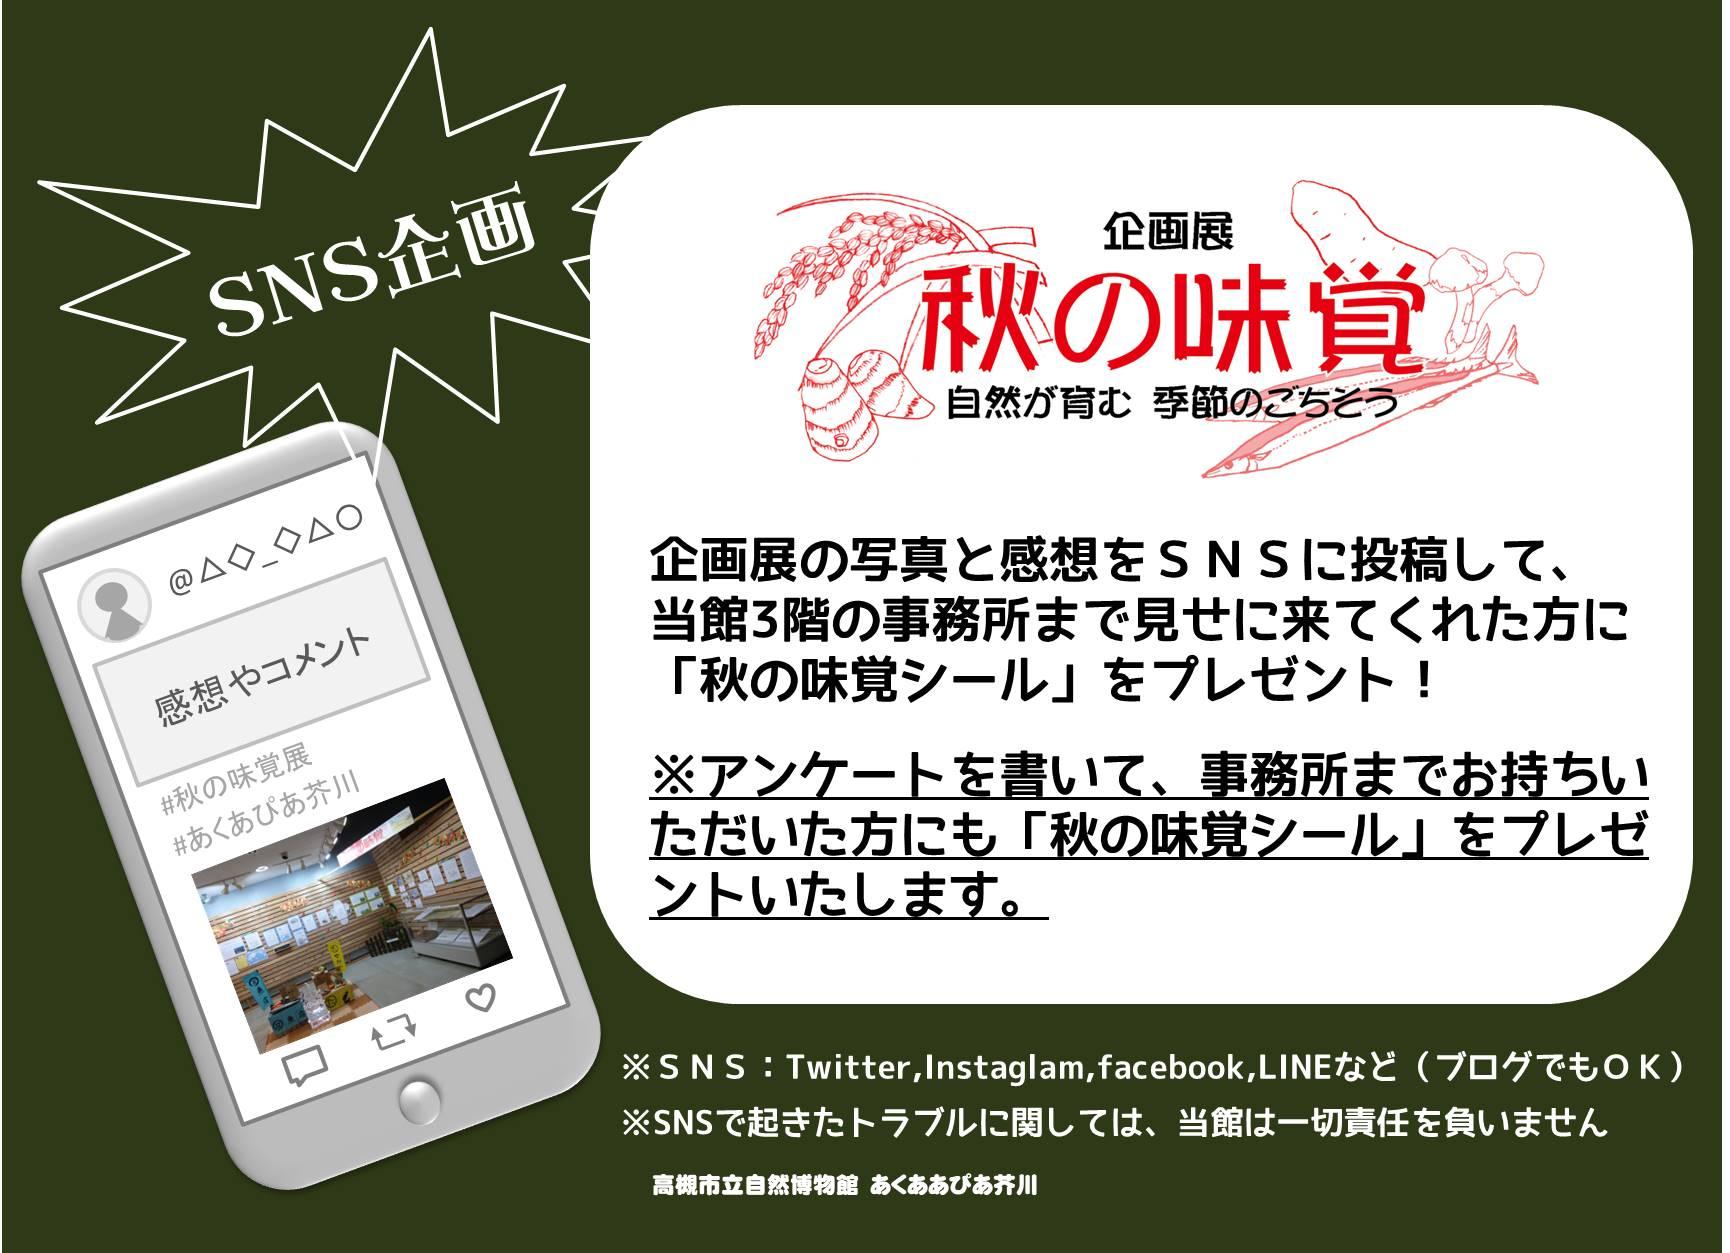 秋の味覚SNS.jpg